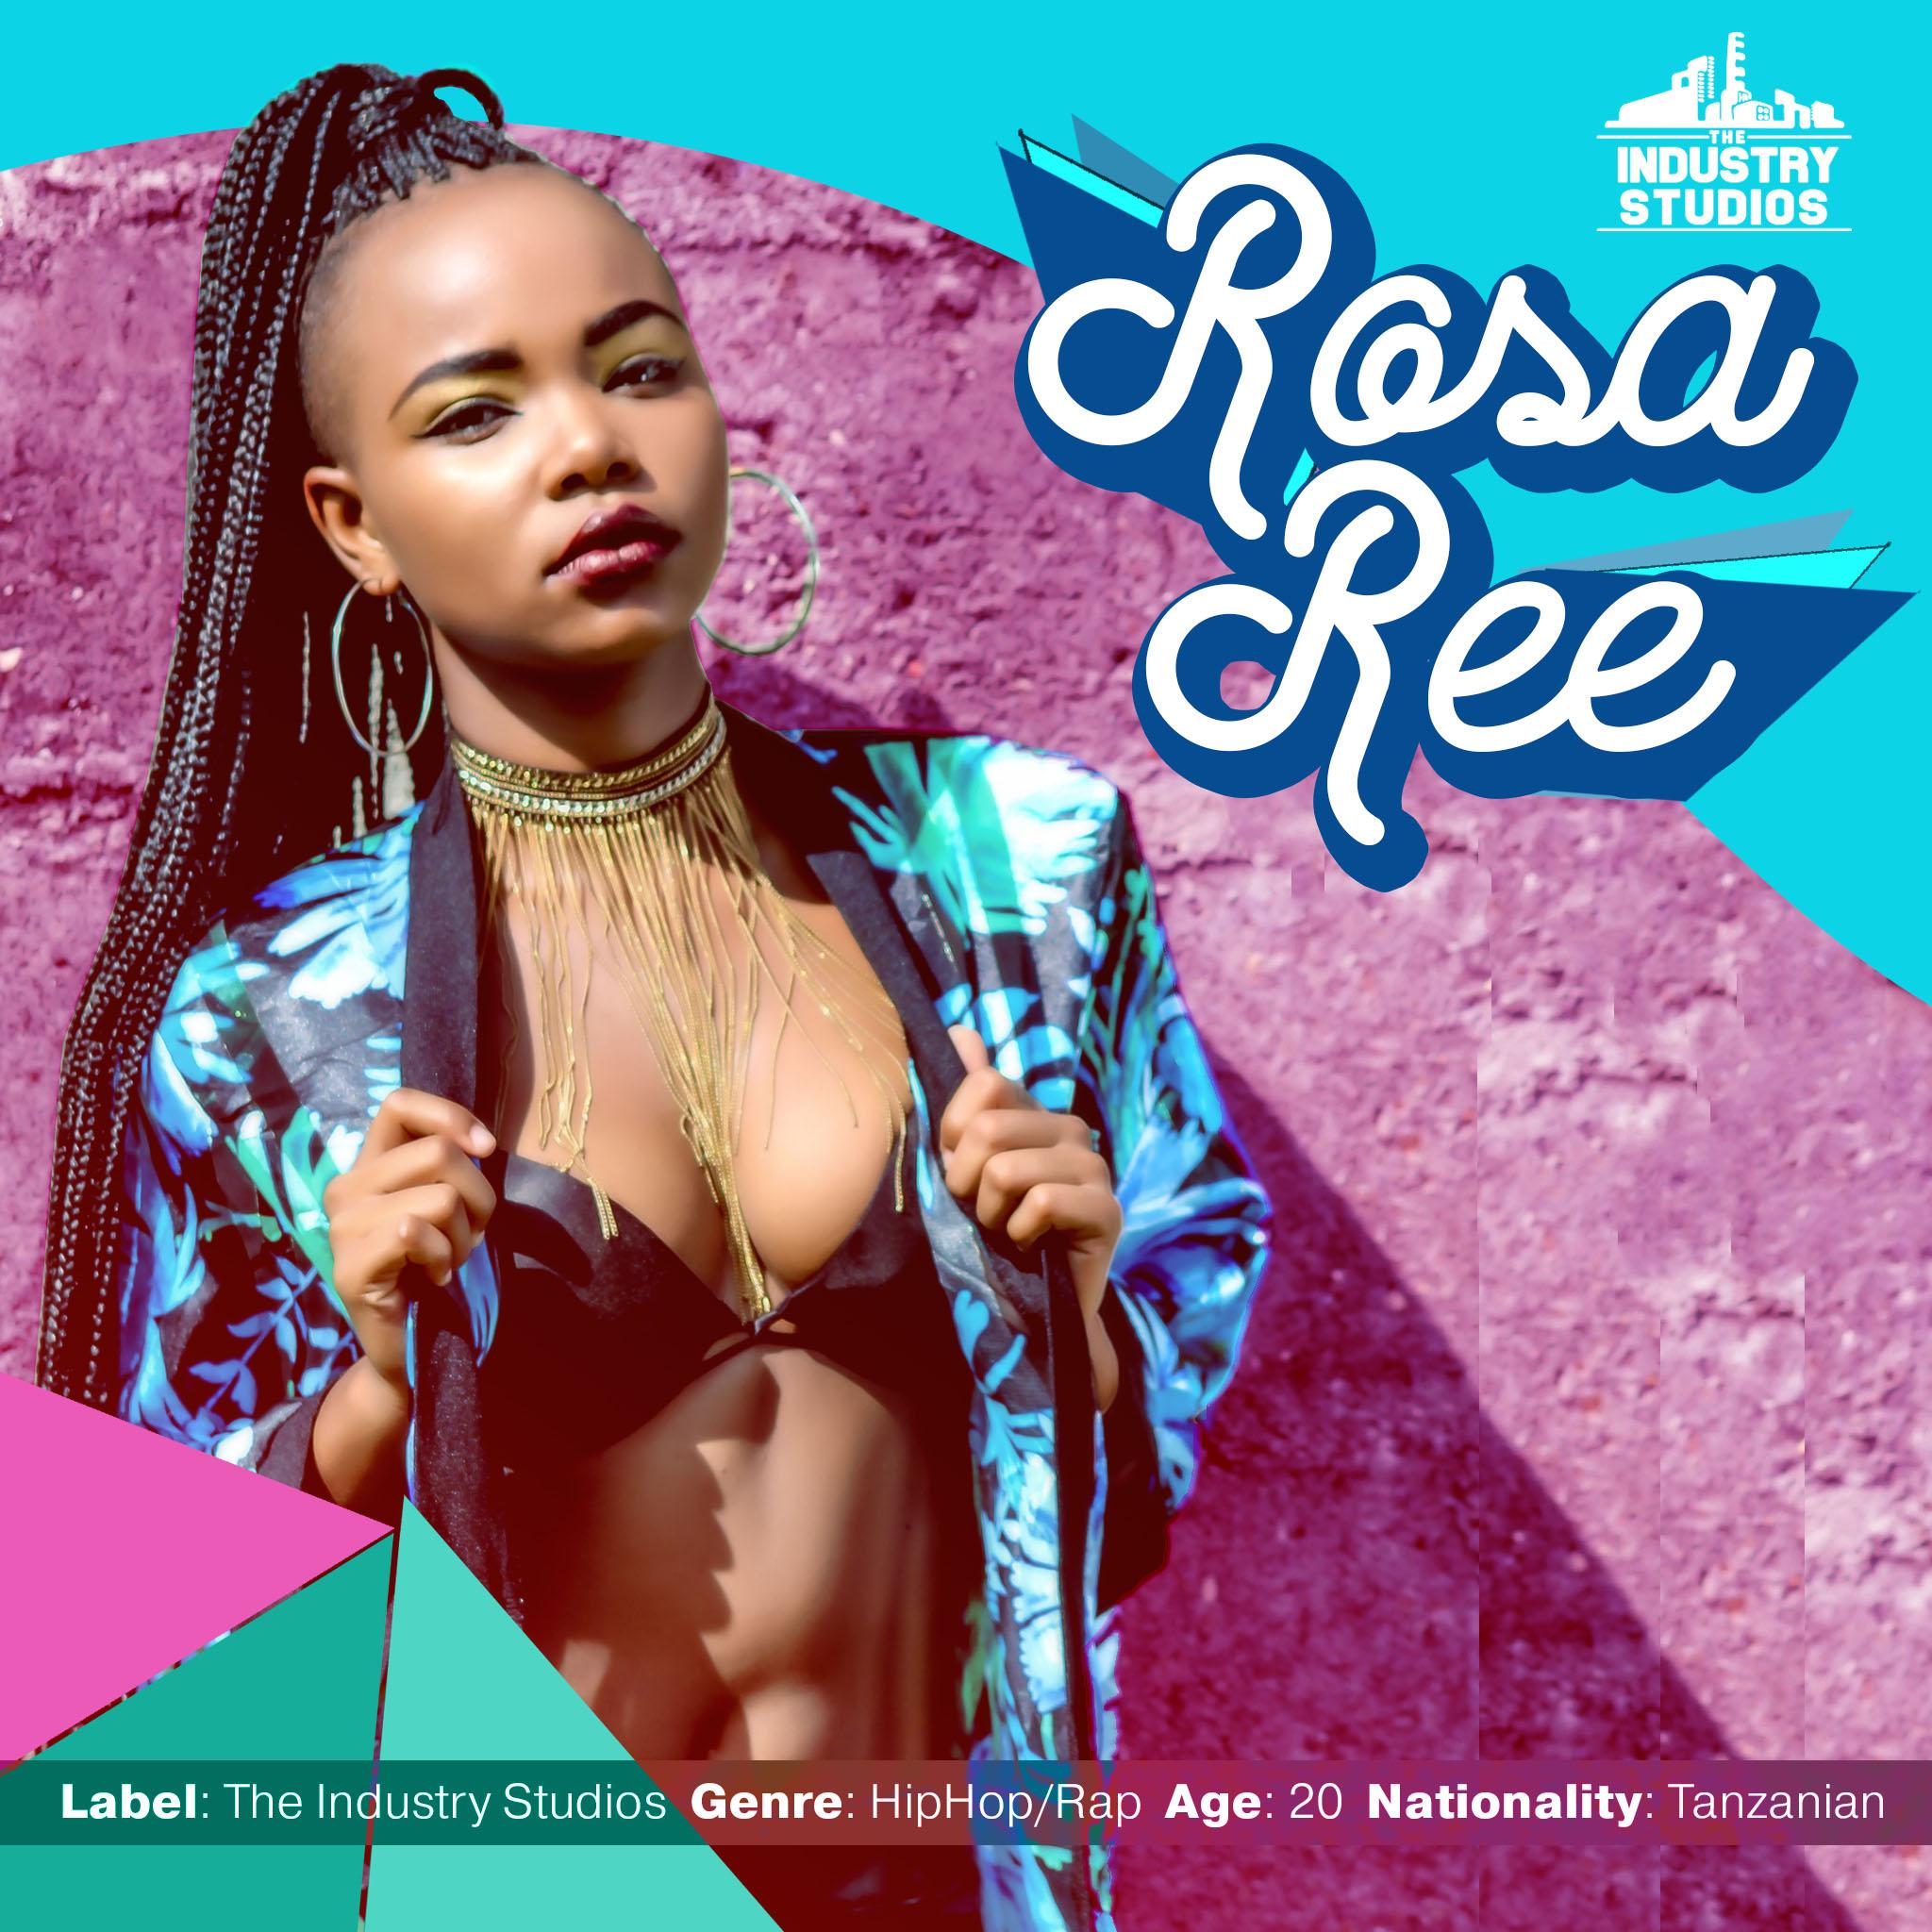 ROSA REE 1